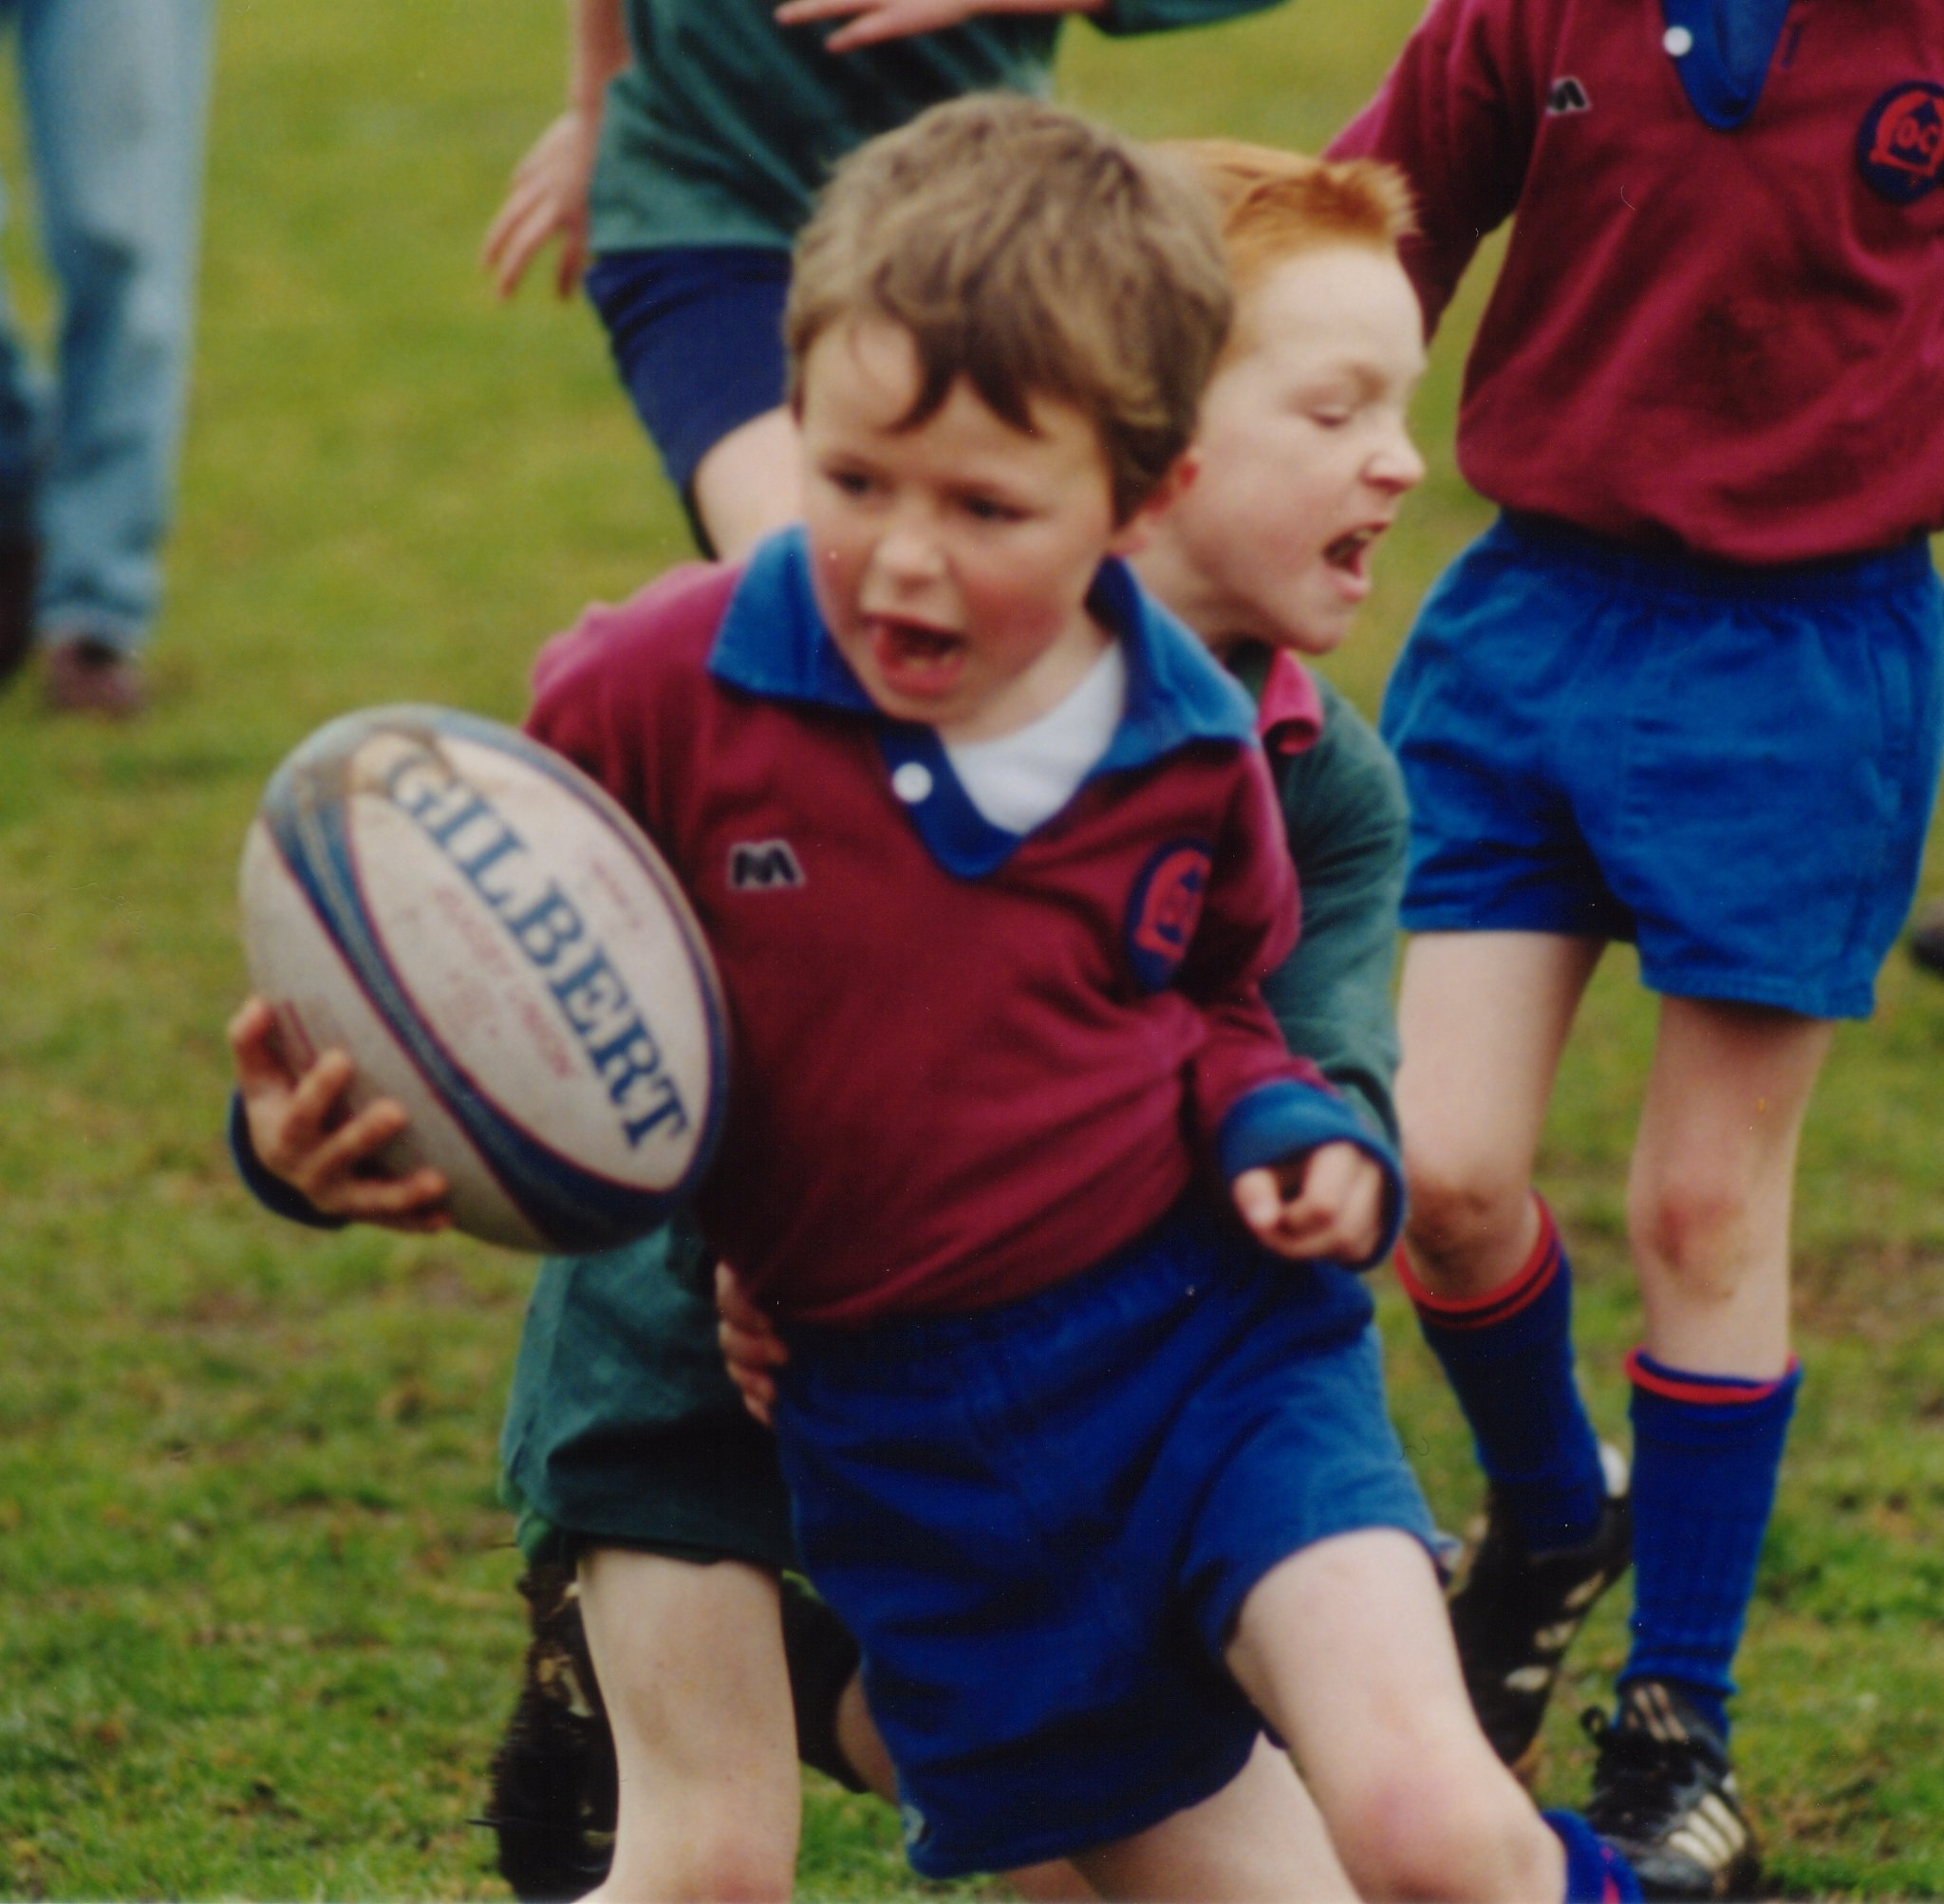 Jake-tackled-2001